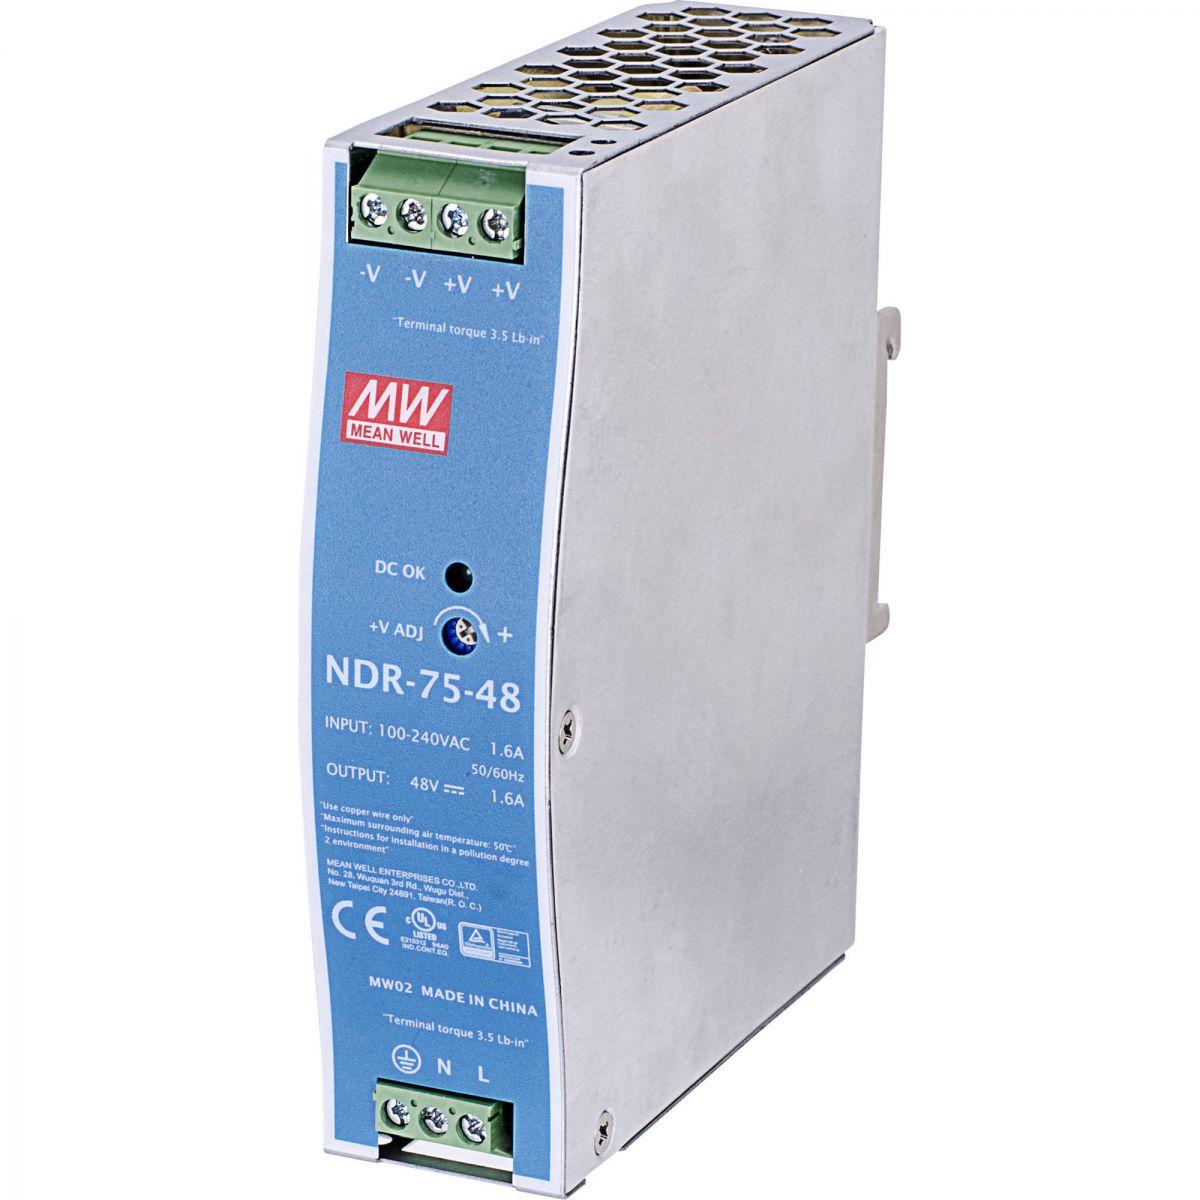 Bộ đổi nguồn 48VDC Vivotek NDR-75-48